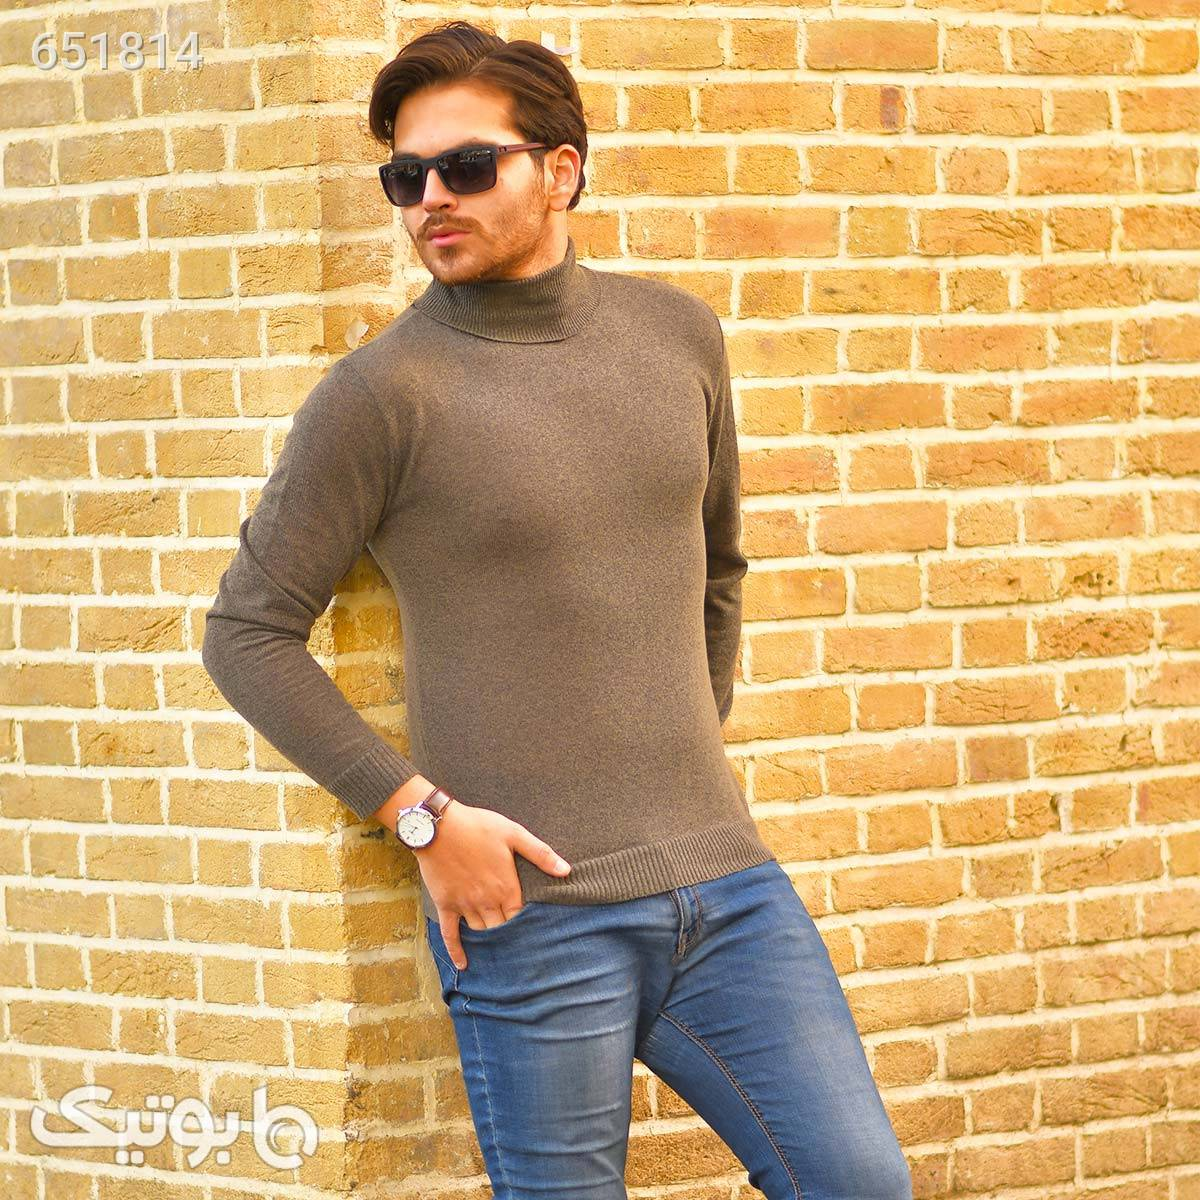 پليور بافت يقه اسكي مردانه مدل Ersan  طلایی پليور و ژاکت مردانه